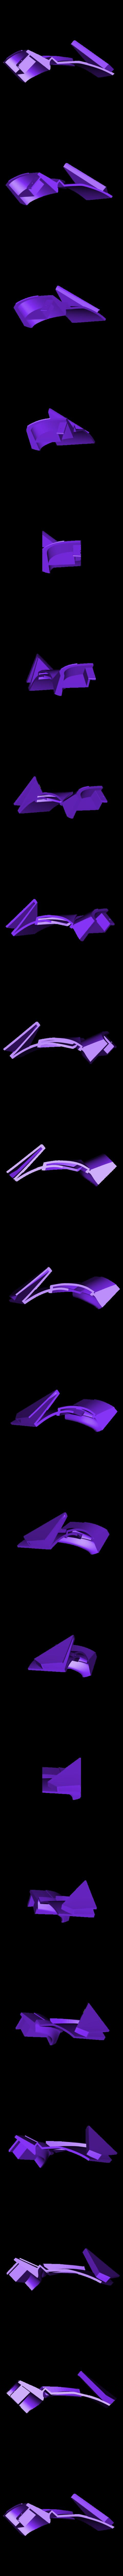 Part 19 v1.stl Download STL file ARF Trooper Helmet • 3D print object, VillainousPropShop